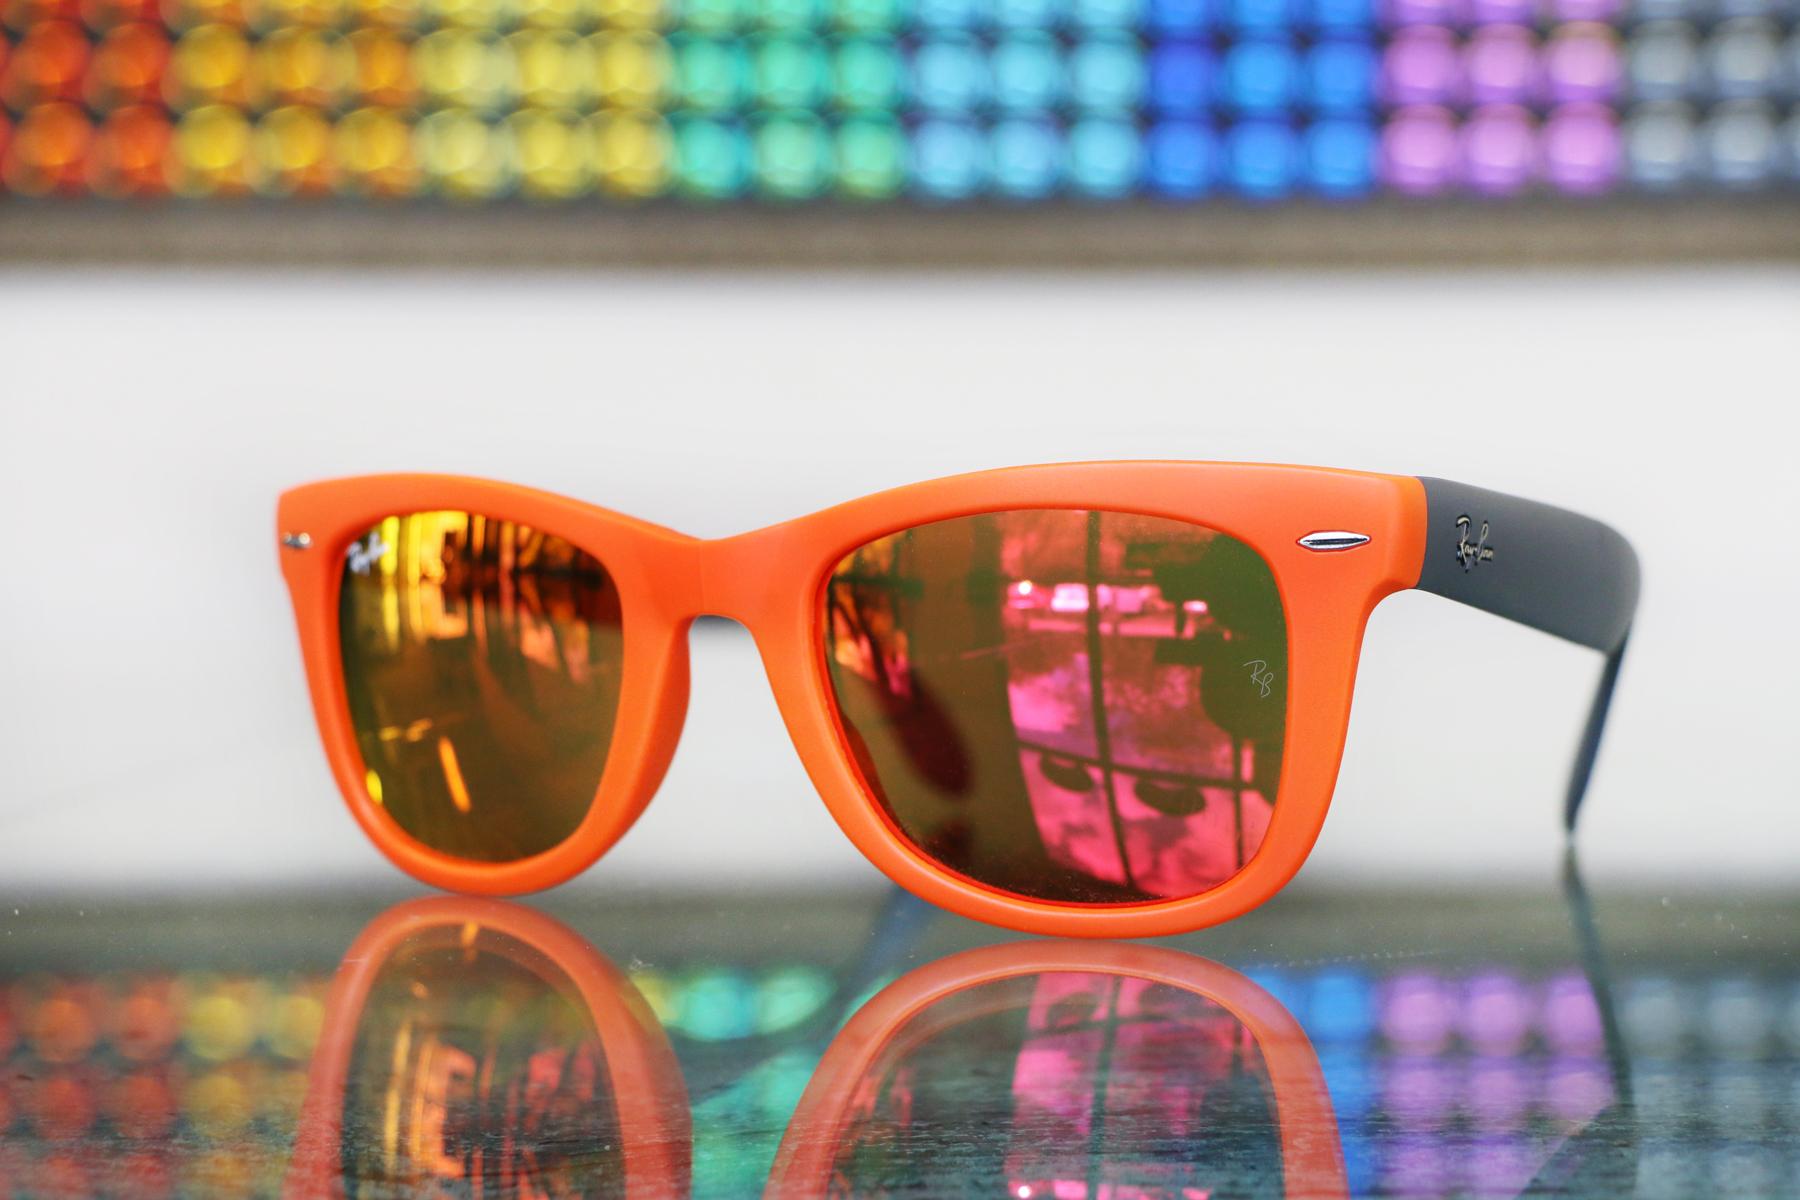 Ray Ban Folding Wayfarer, Ray Ban Prescription Sunglasses